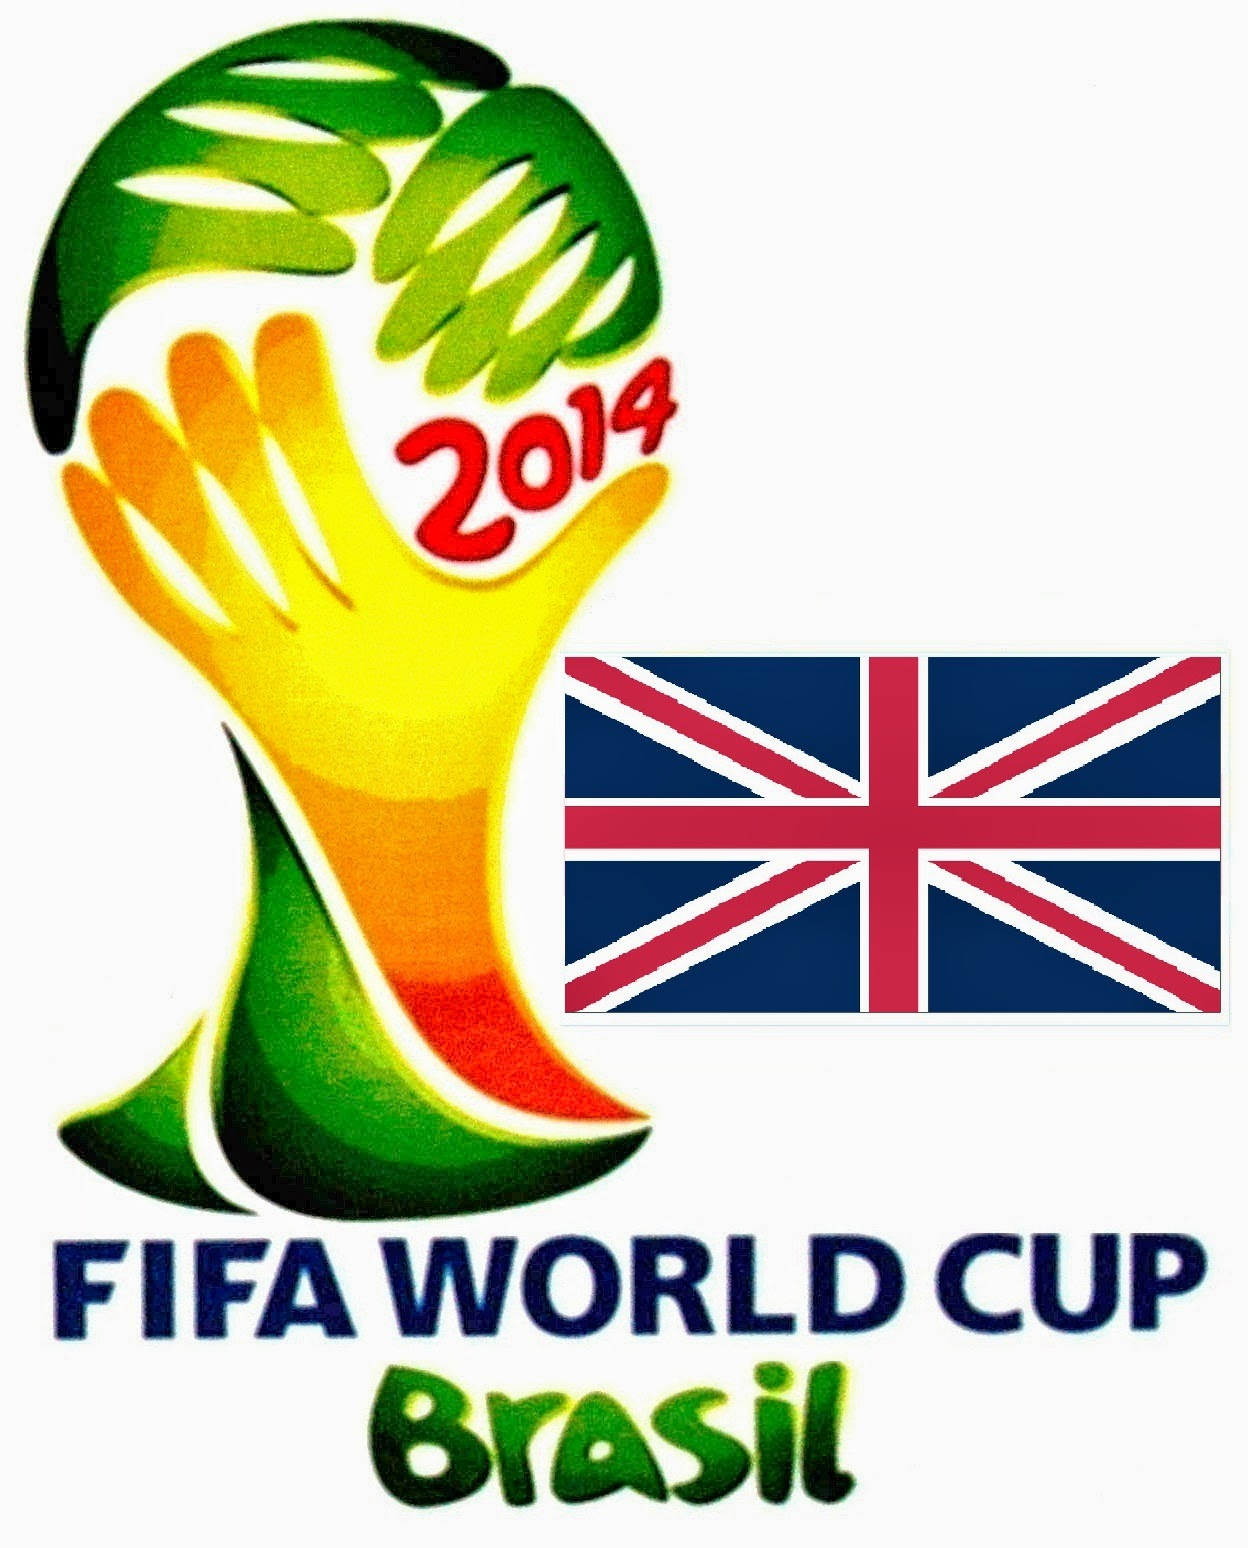 Daftar Nama Pemain Timnas Inggris Piala Dunia 2014